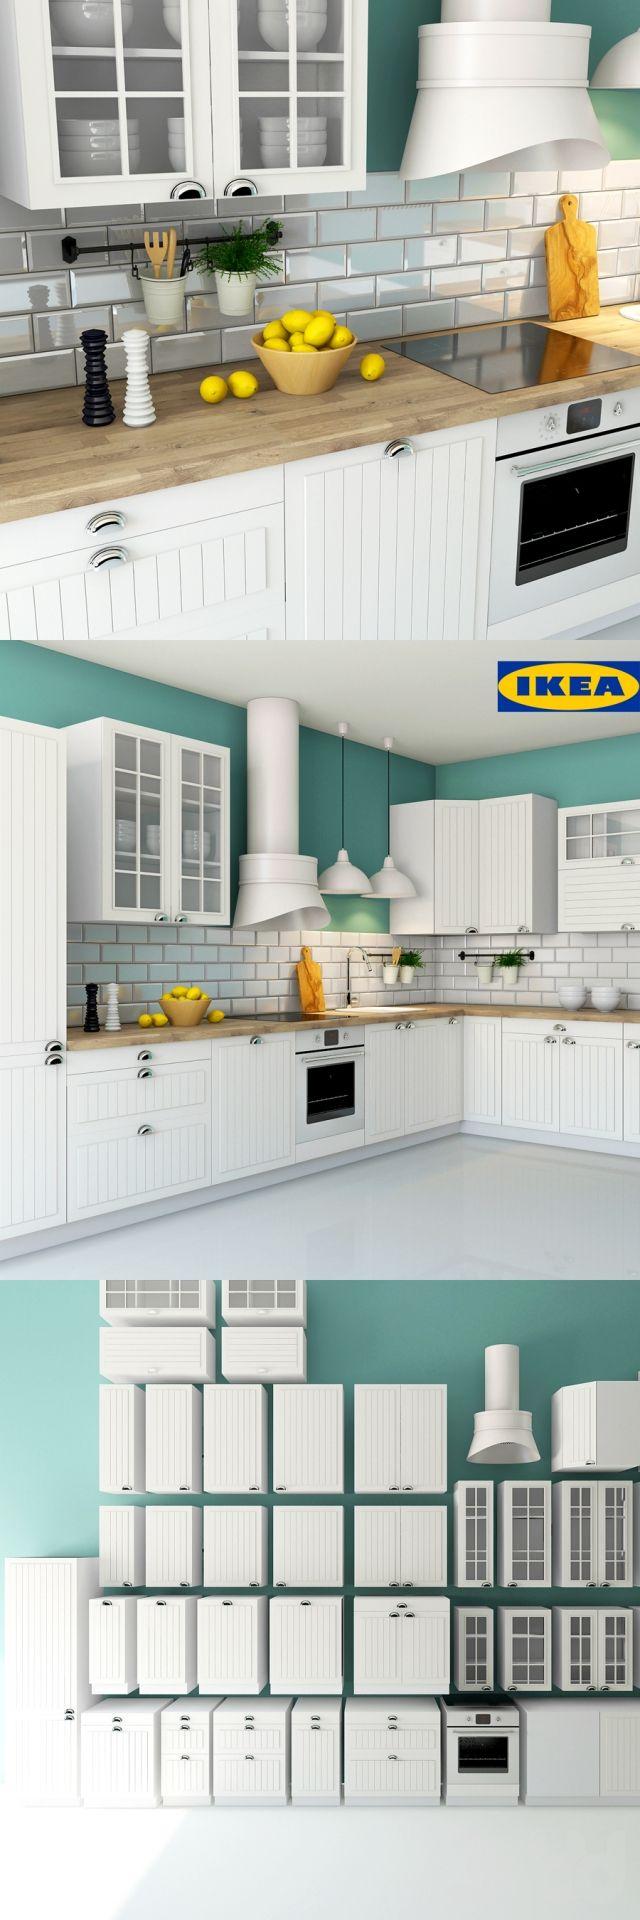 кухня ИКЕА СТОТ ФАКТУМ (IKEA STAT FAKTUM)